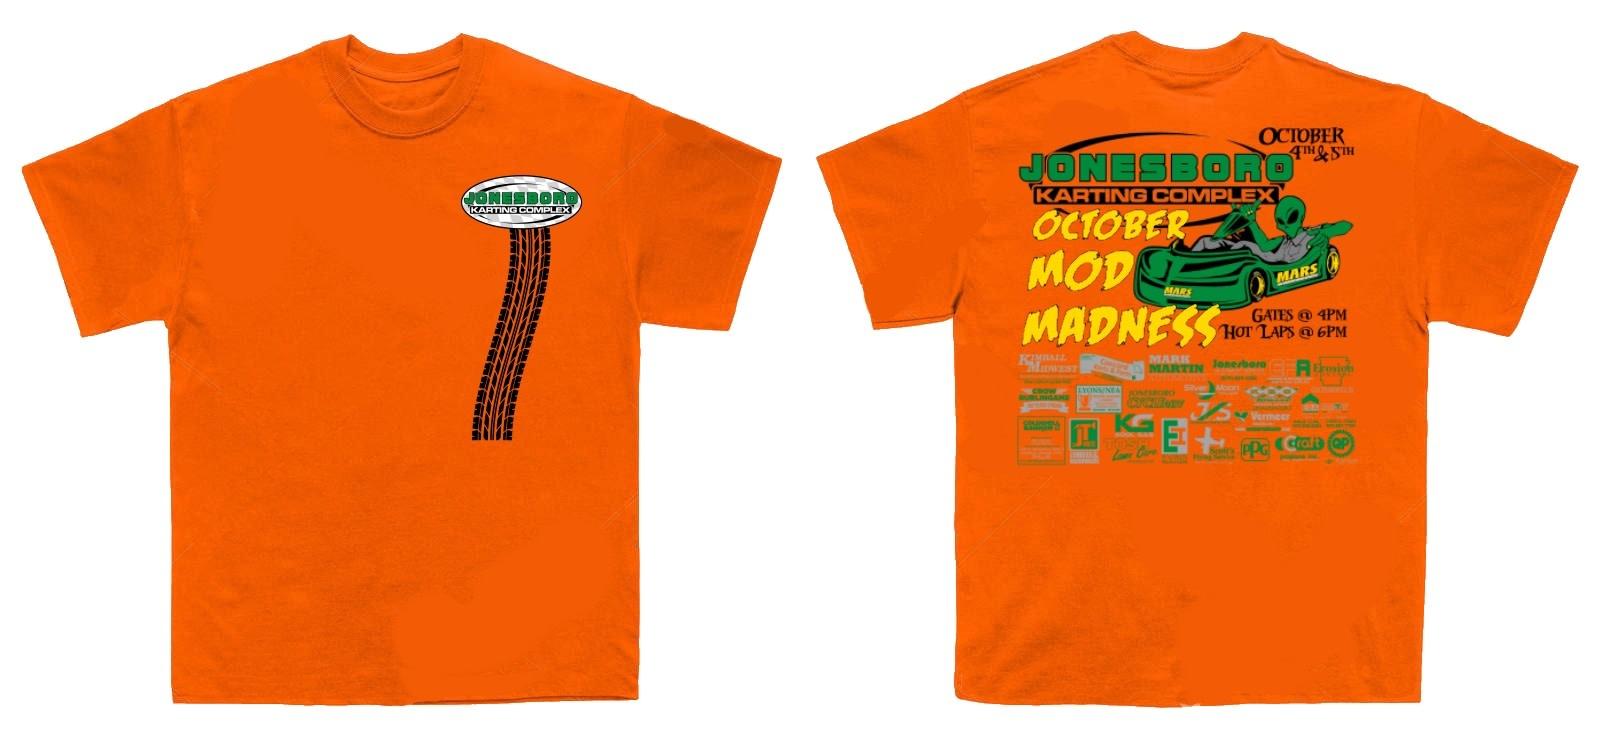 (preorder) 2019 Pro Mod Madness Shirt Youth Large Orange